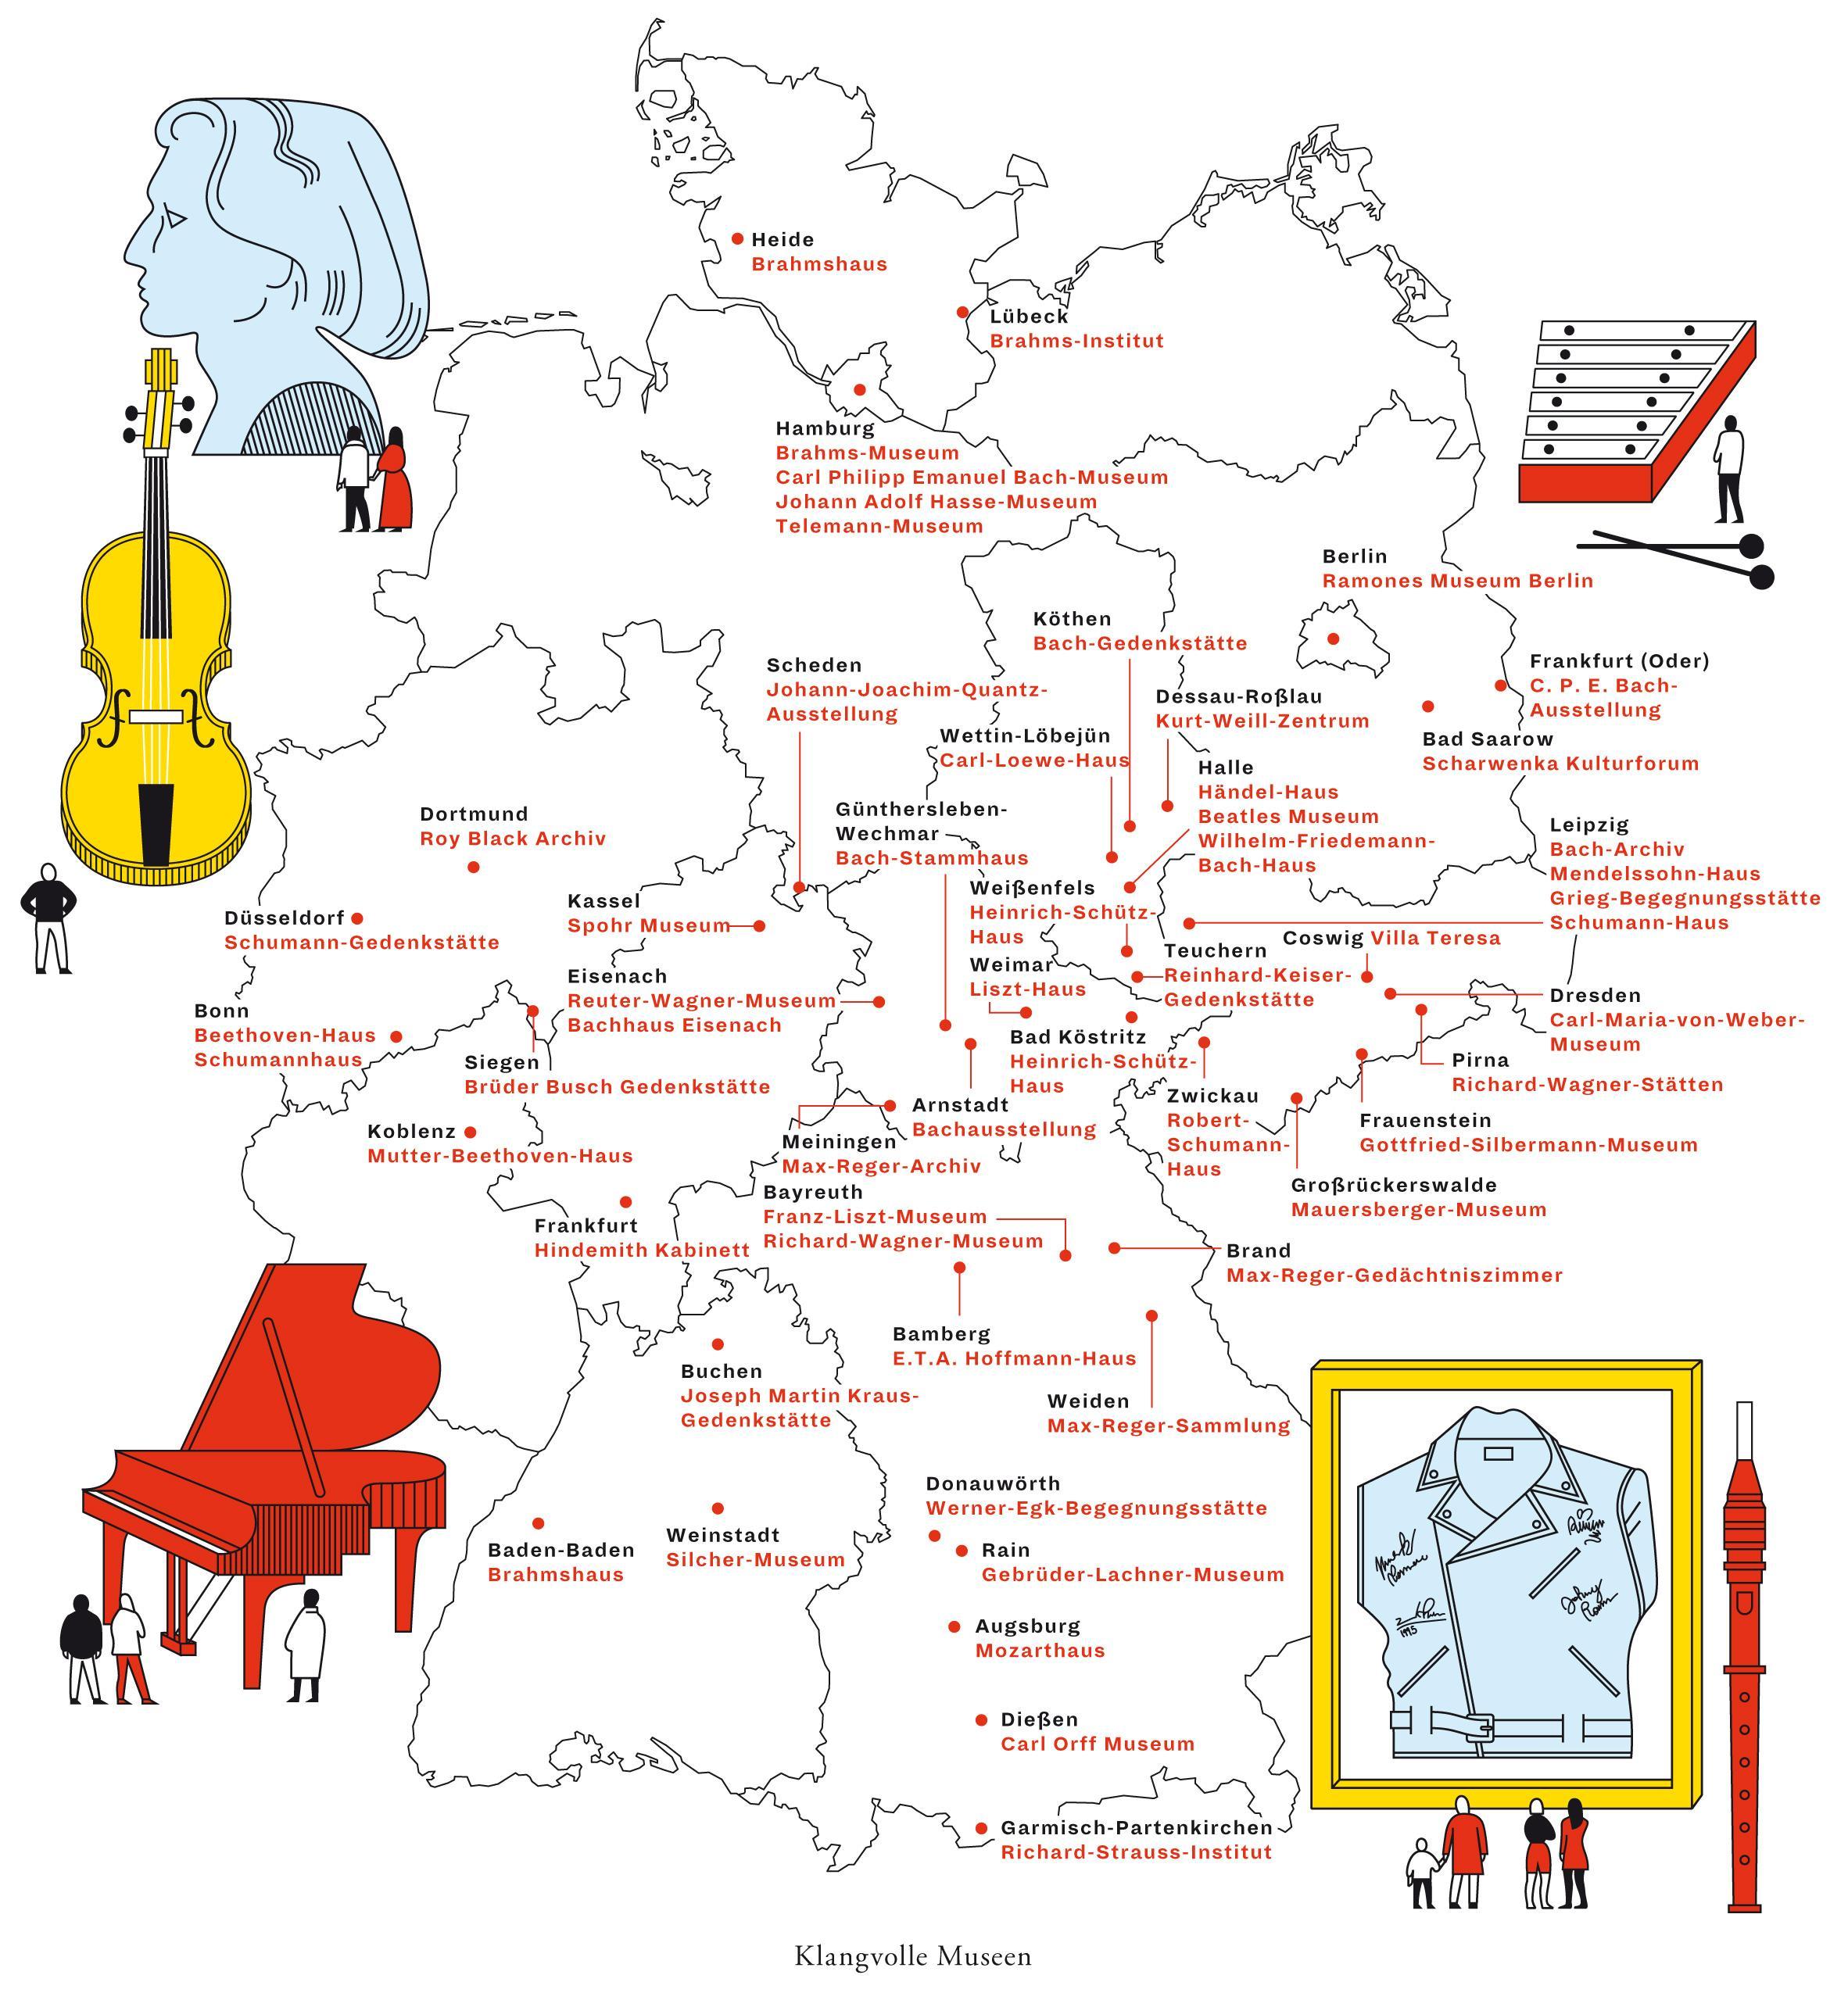 ZeitMagazin, Deutschlandkarte, Musik, Musiker, Museum, Johann Sebastian Bach, Richard Wagner, Ludwig van Beethoven